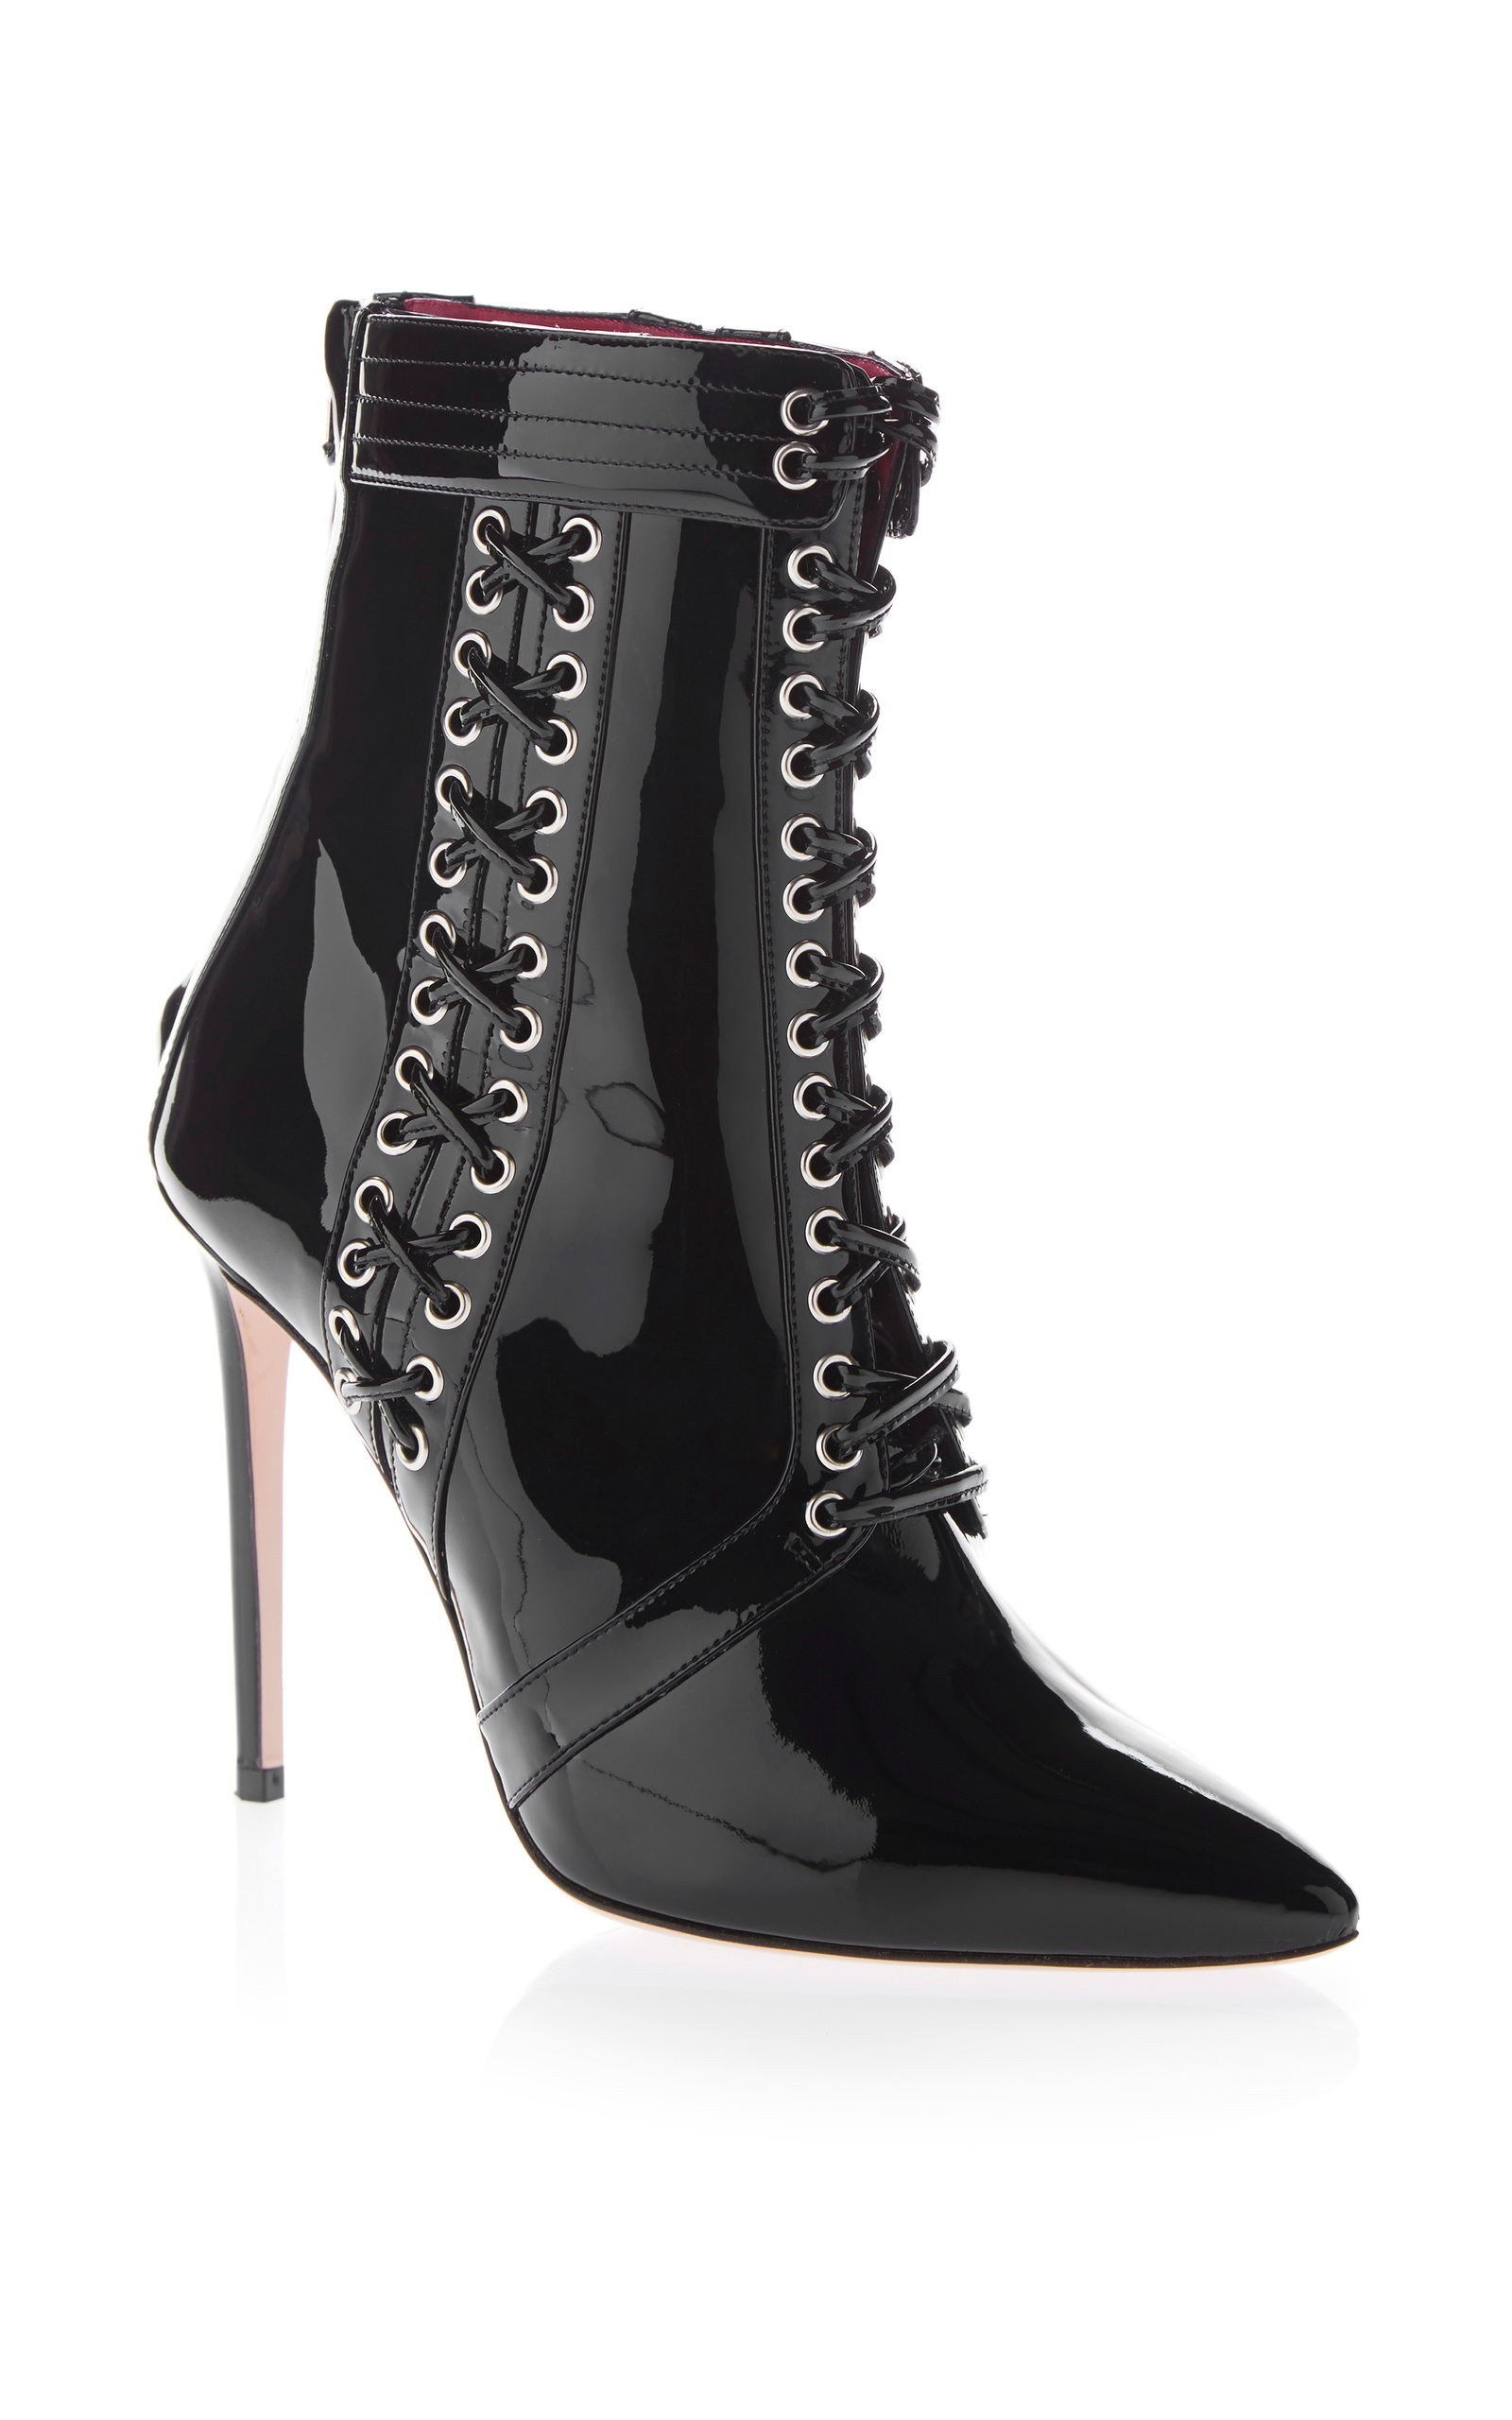 OSCAR TIYE Leather Lace Up Boots 9zeqcLR